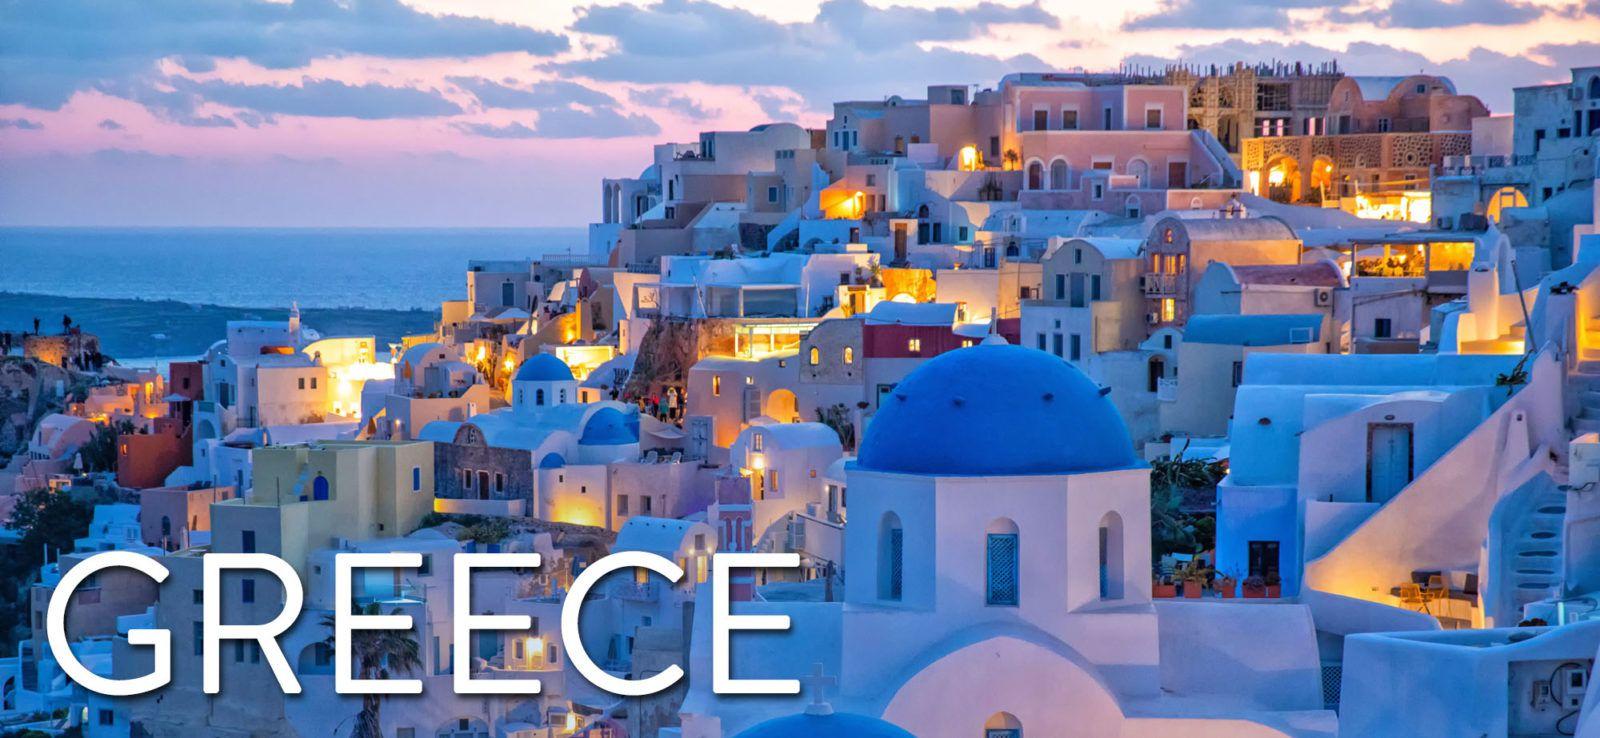 Greece-Header-Photo-1600x738.jpg.optimal